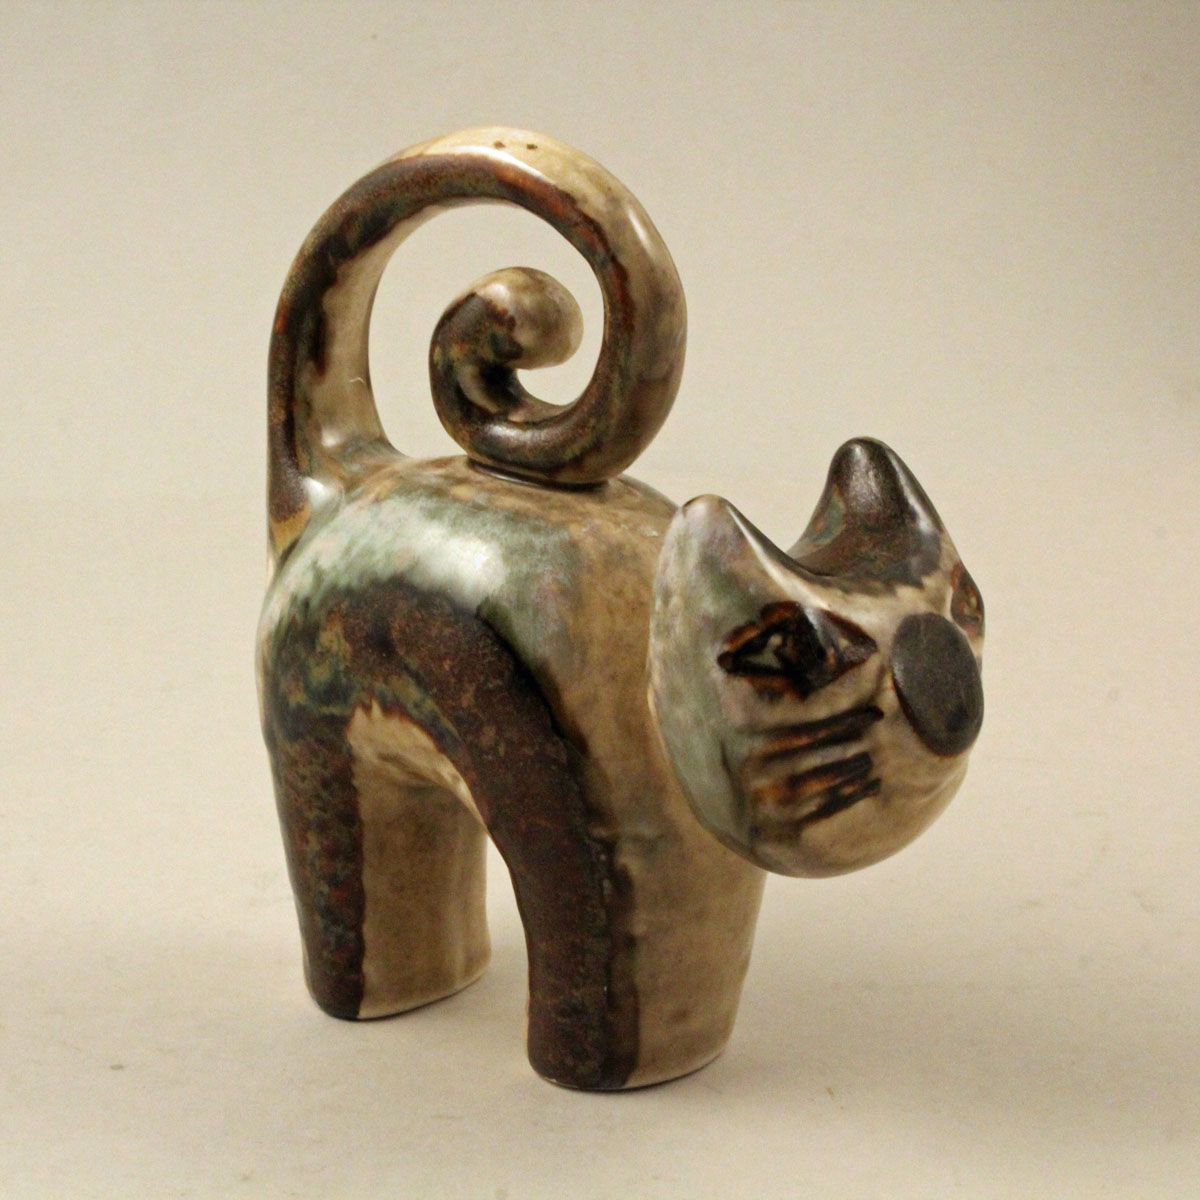 Joseph Simon Cat Sculpture S\u00f8holm Soholm Made In Denmark Studio Pottery Ceramic Folk Art Cat Figurine Danish Art S\u00f8holm Stent\u00f8j